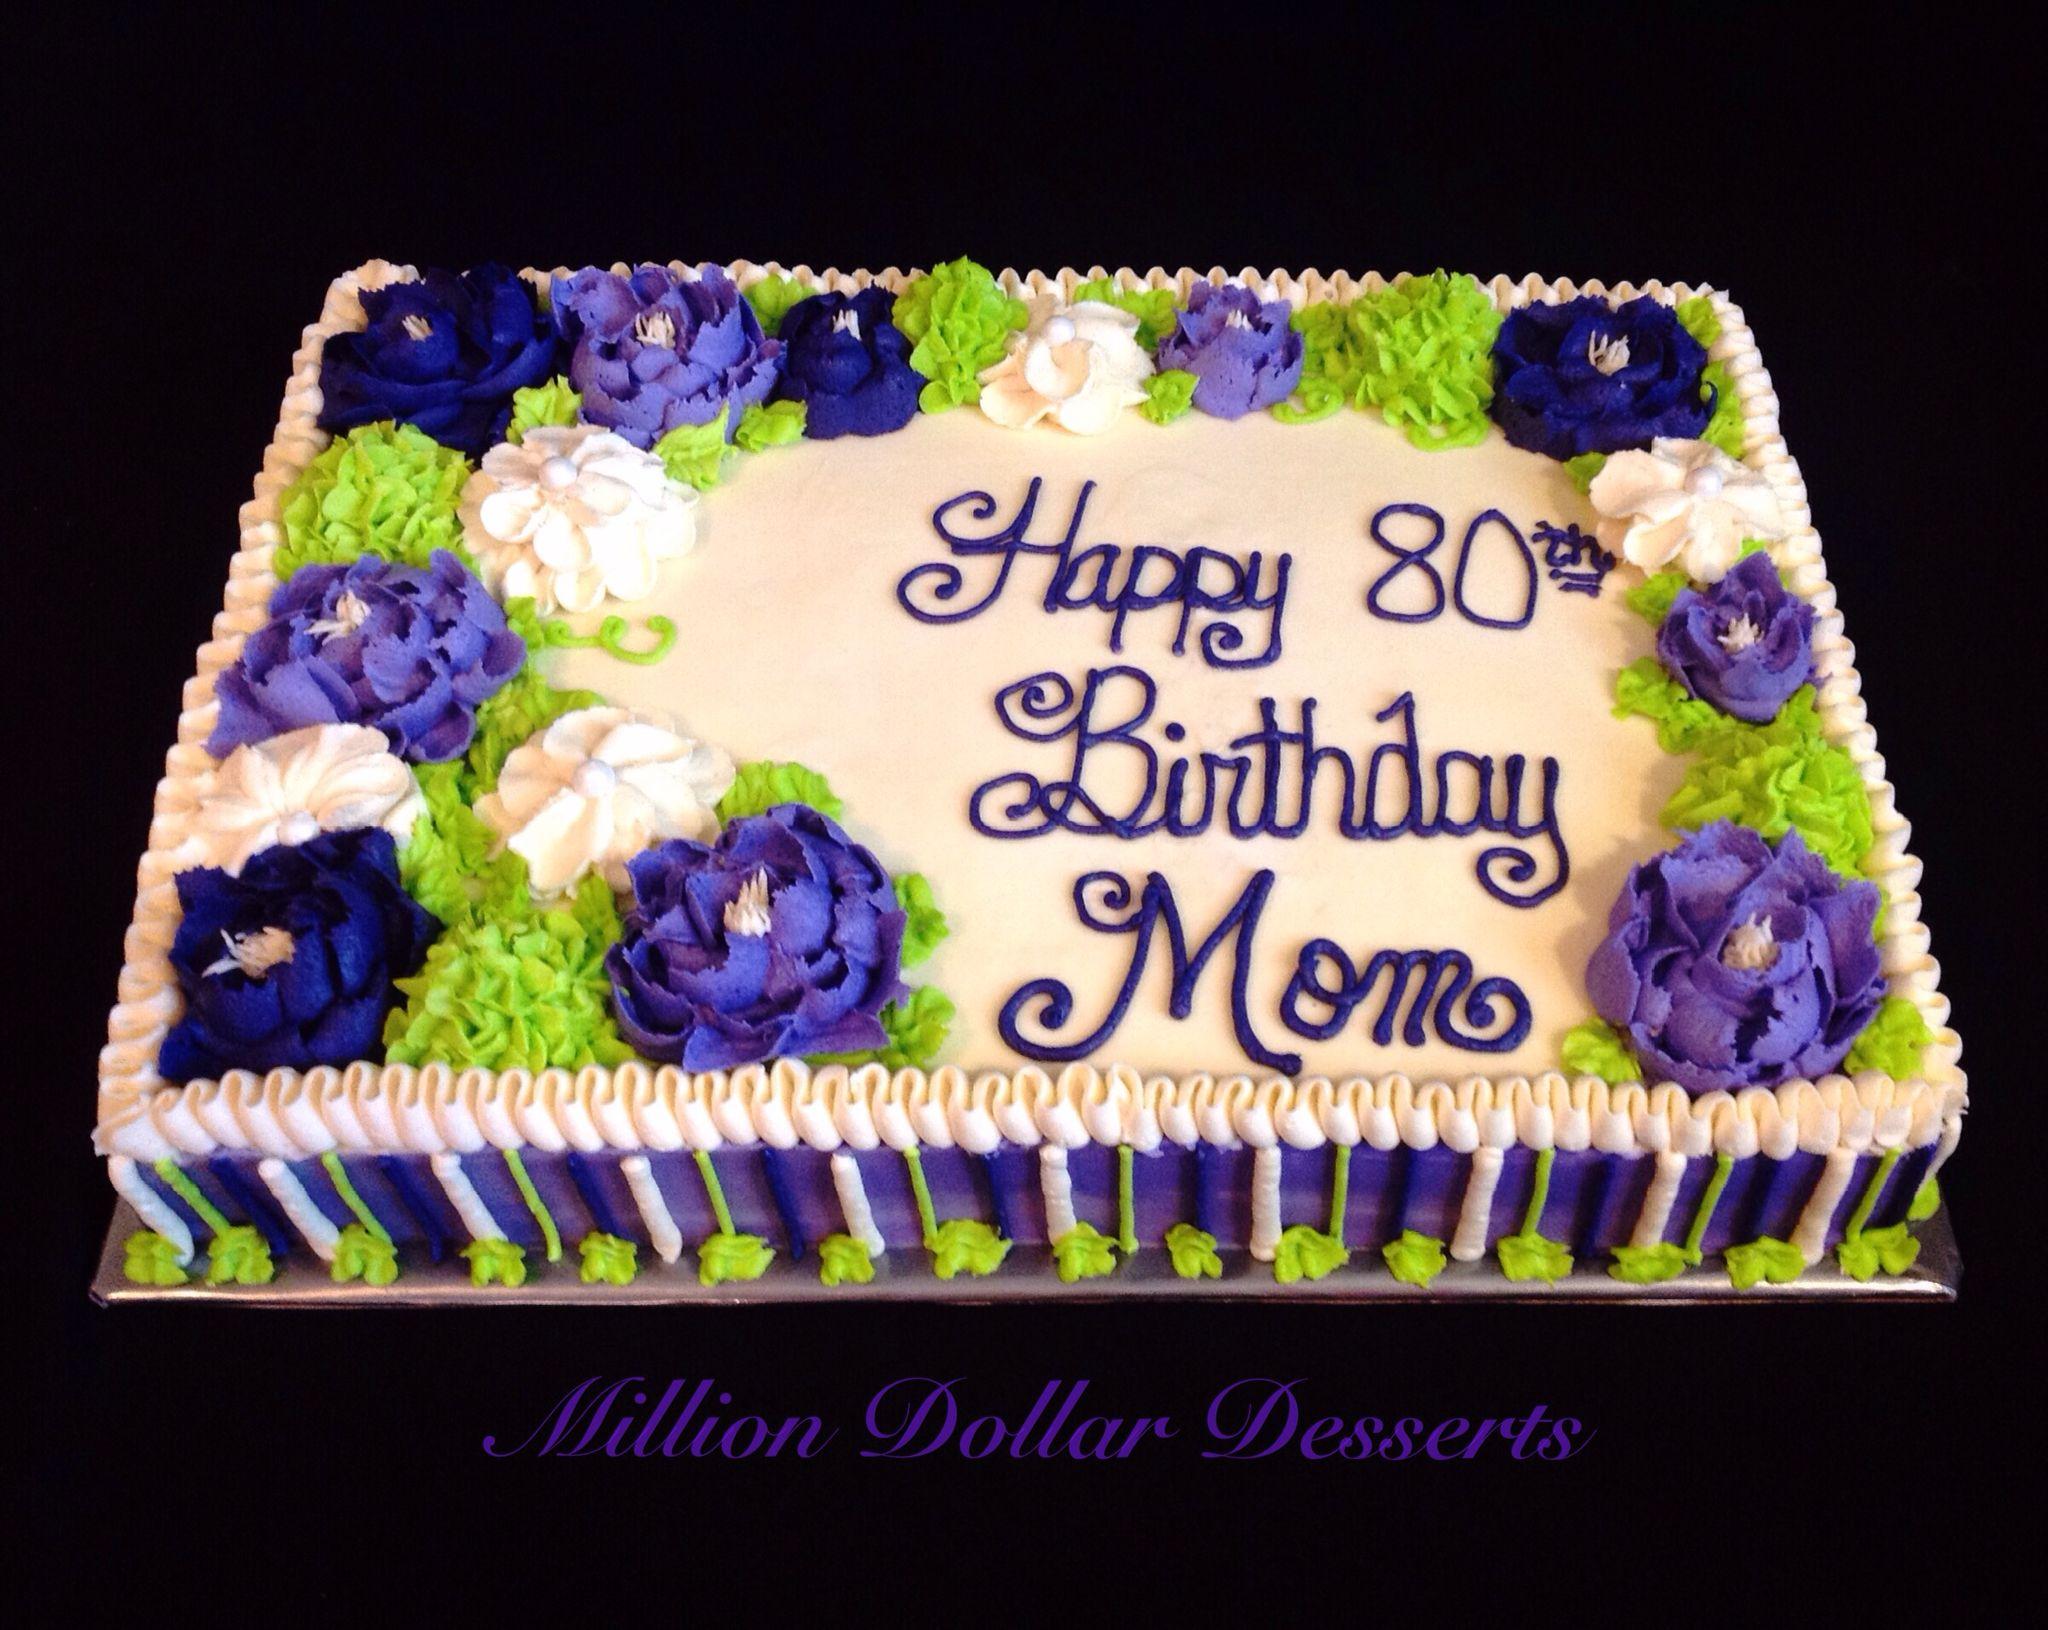 1 2 Sheet Buttercream Floral Birthday Cake Million Dollar